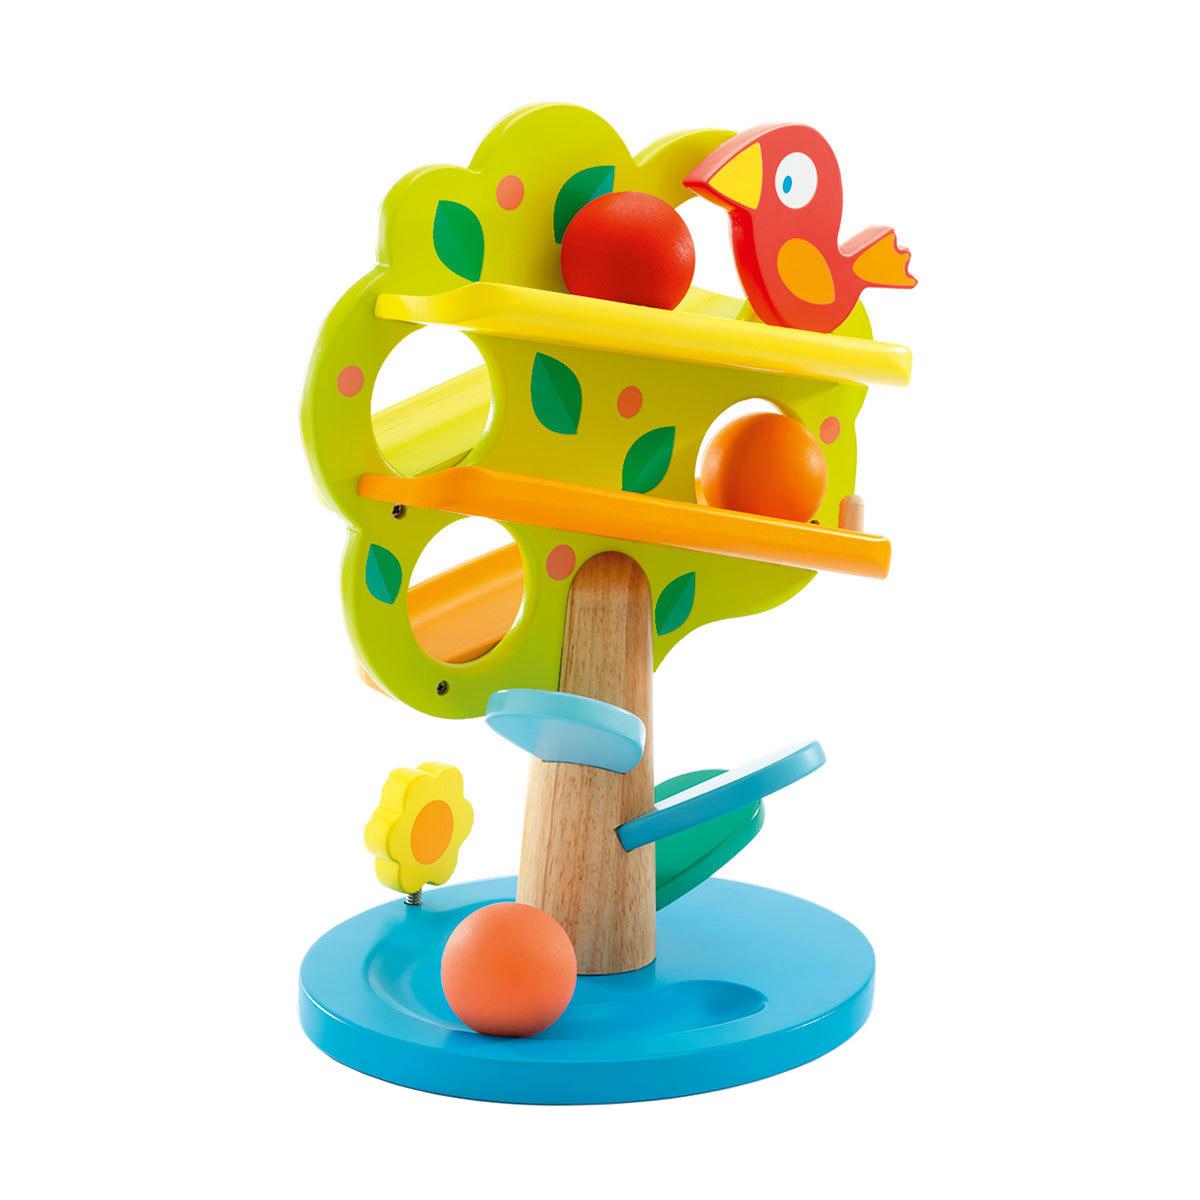 Mes premiers jouets Tac Boum Pom Tac Boum Pom